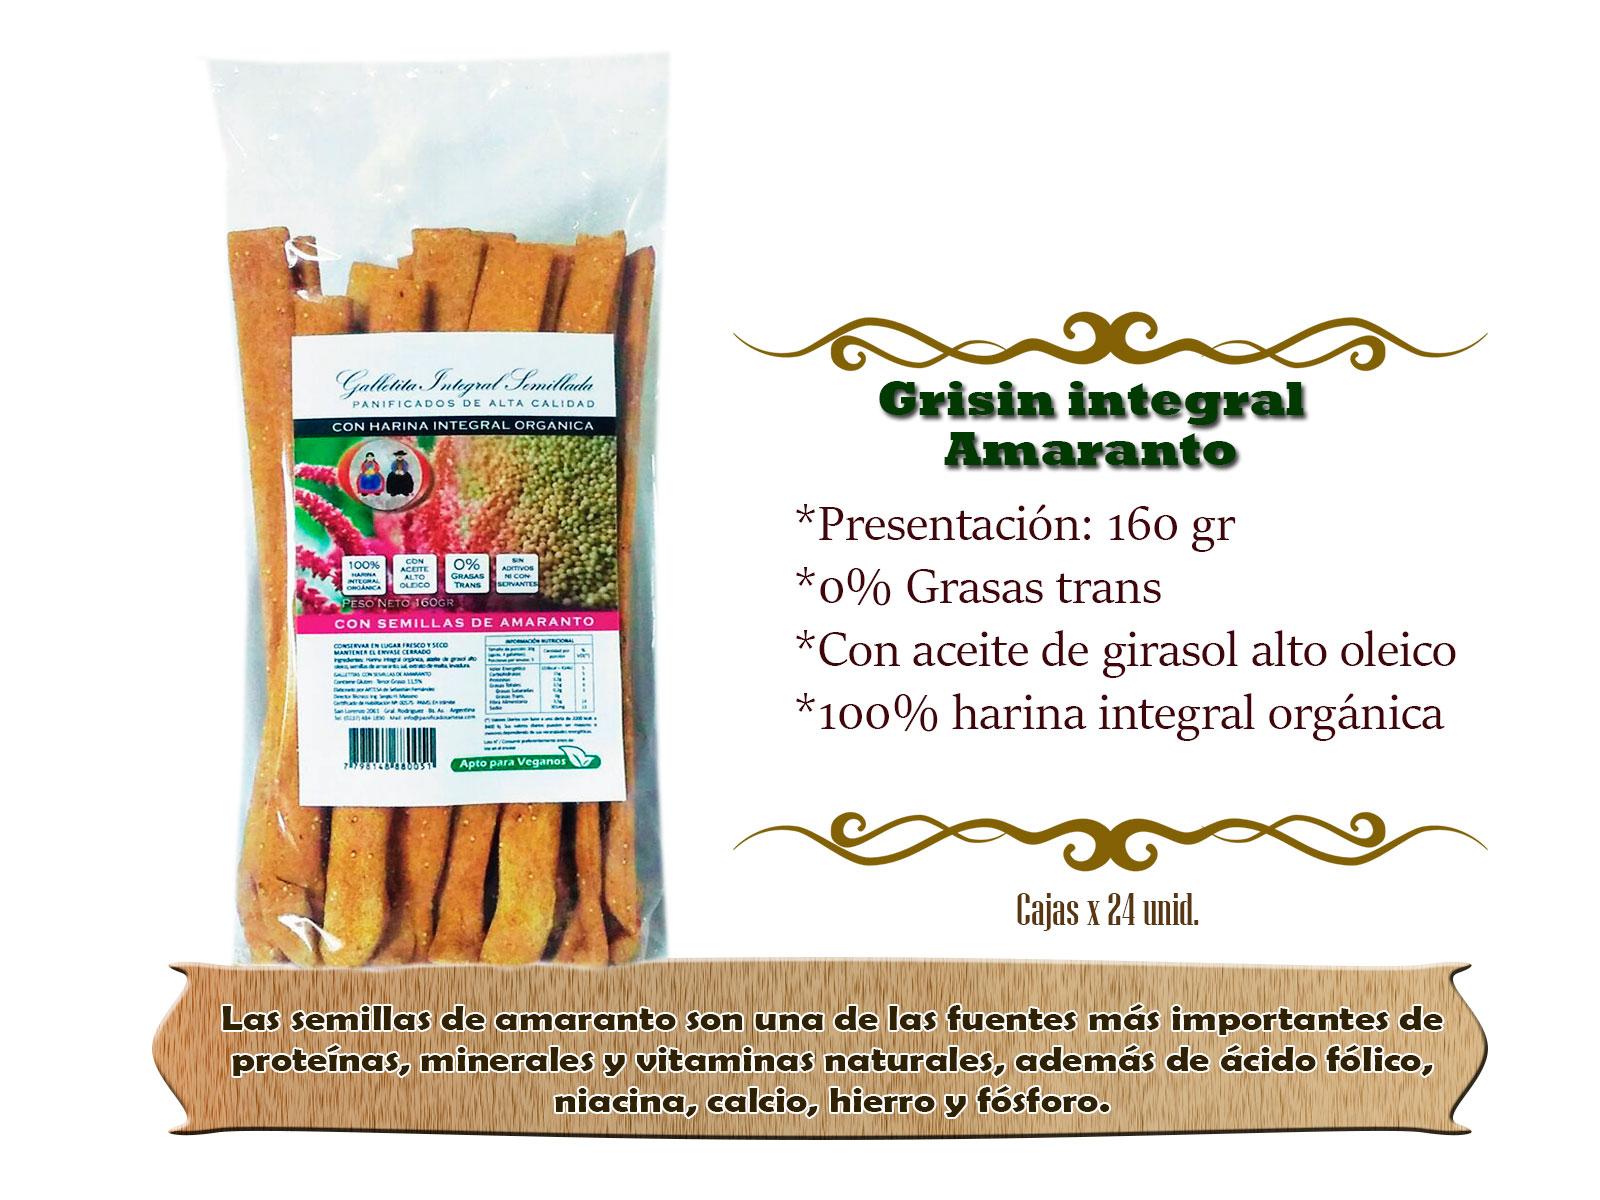 Grisin Integral de Amaranto